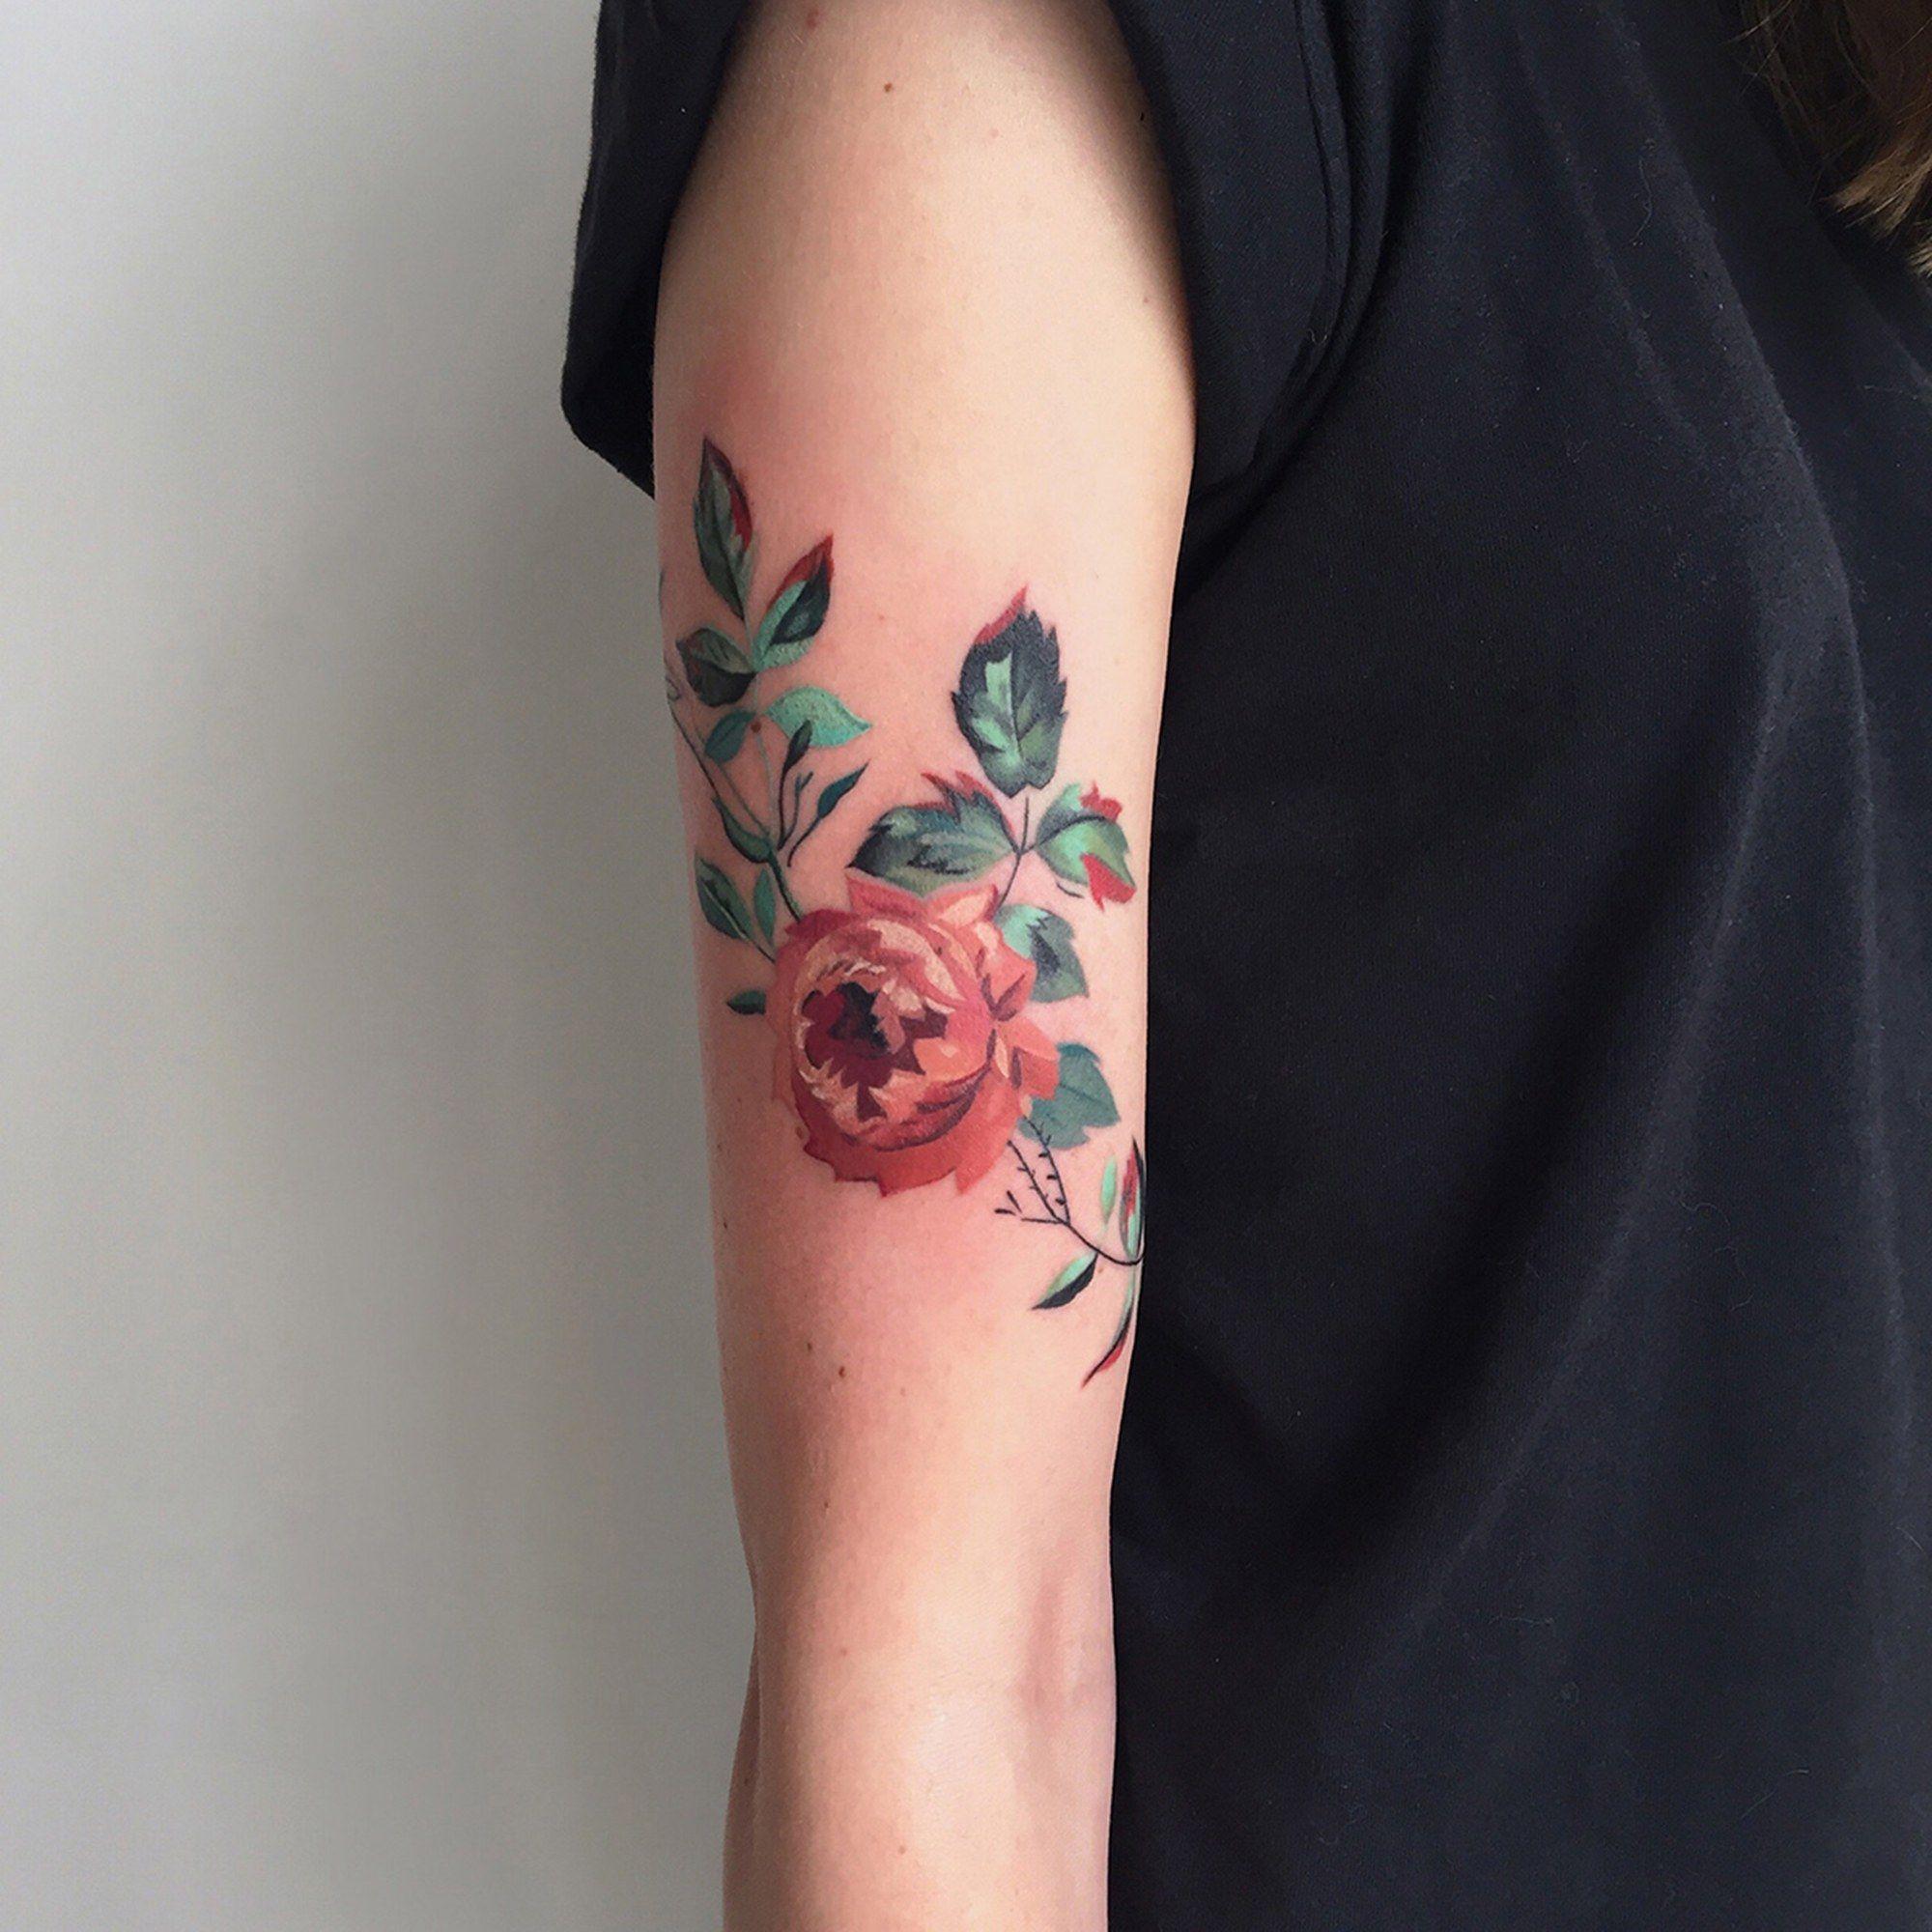 23 Beautiful Flower Tattoos for Women